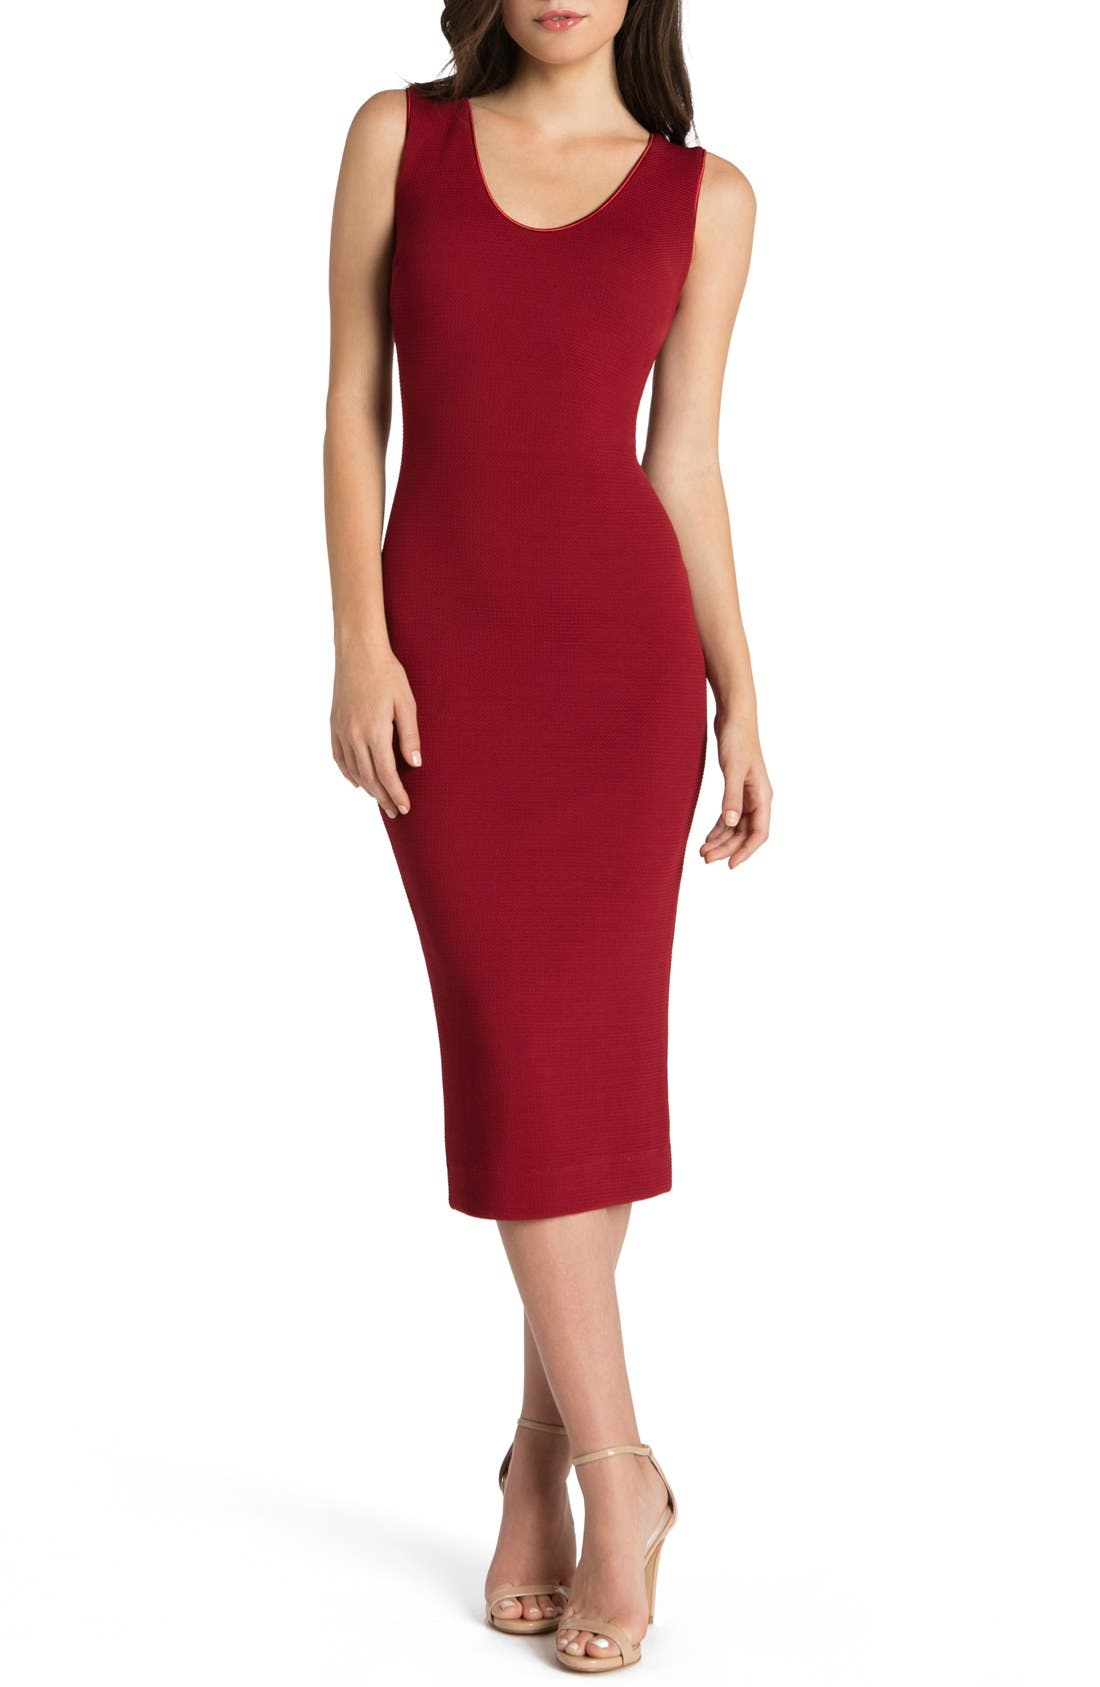 DRESS THE POPULATION Cori Stretch Body-Con Dress